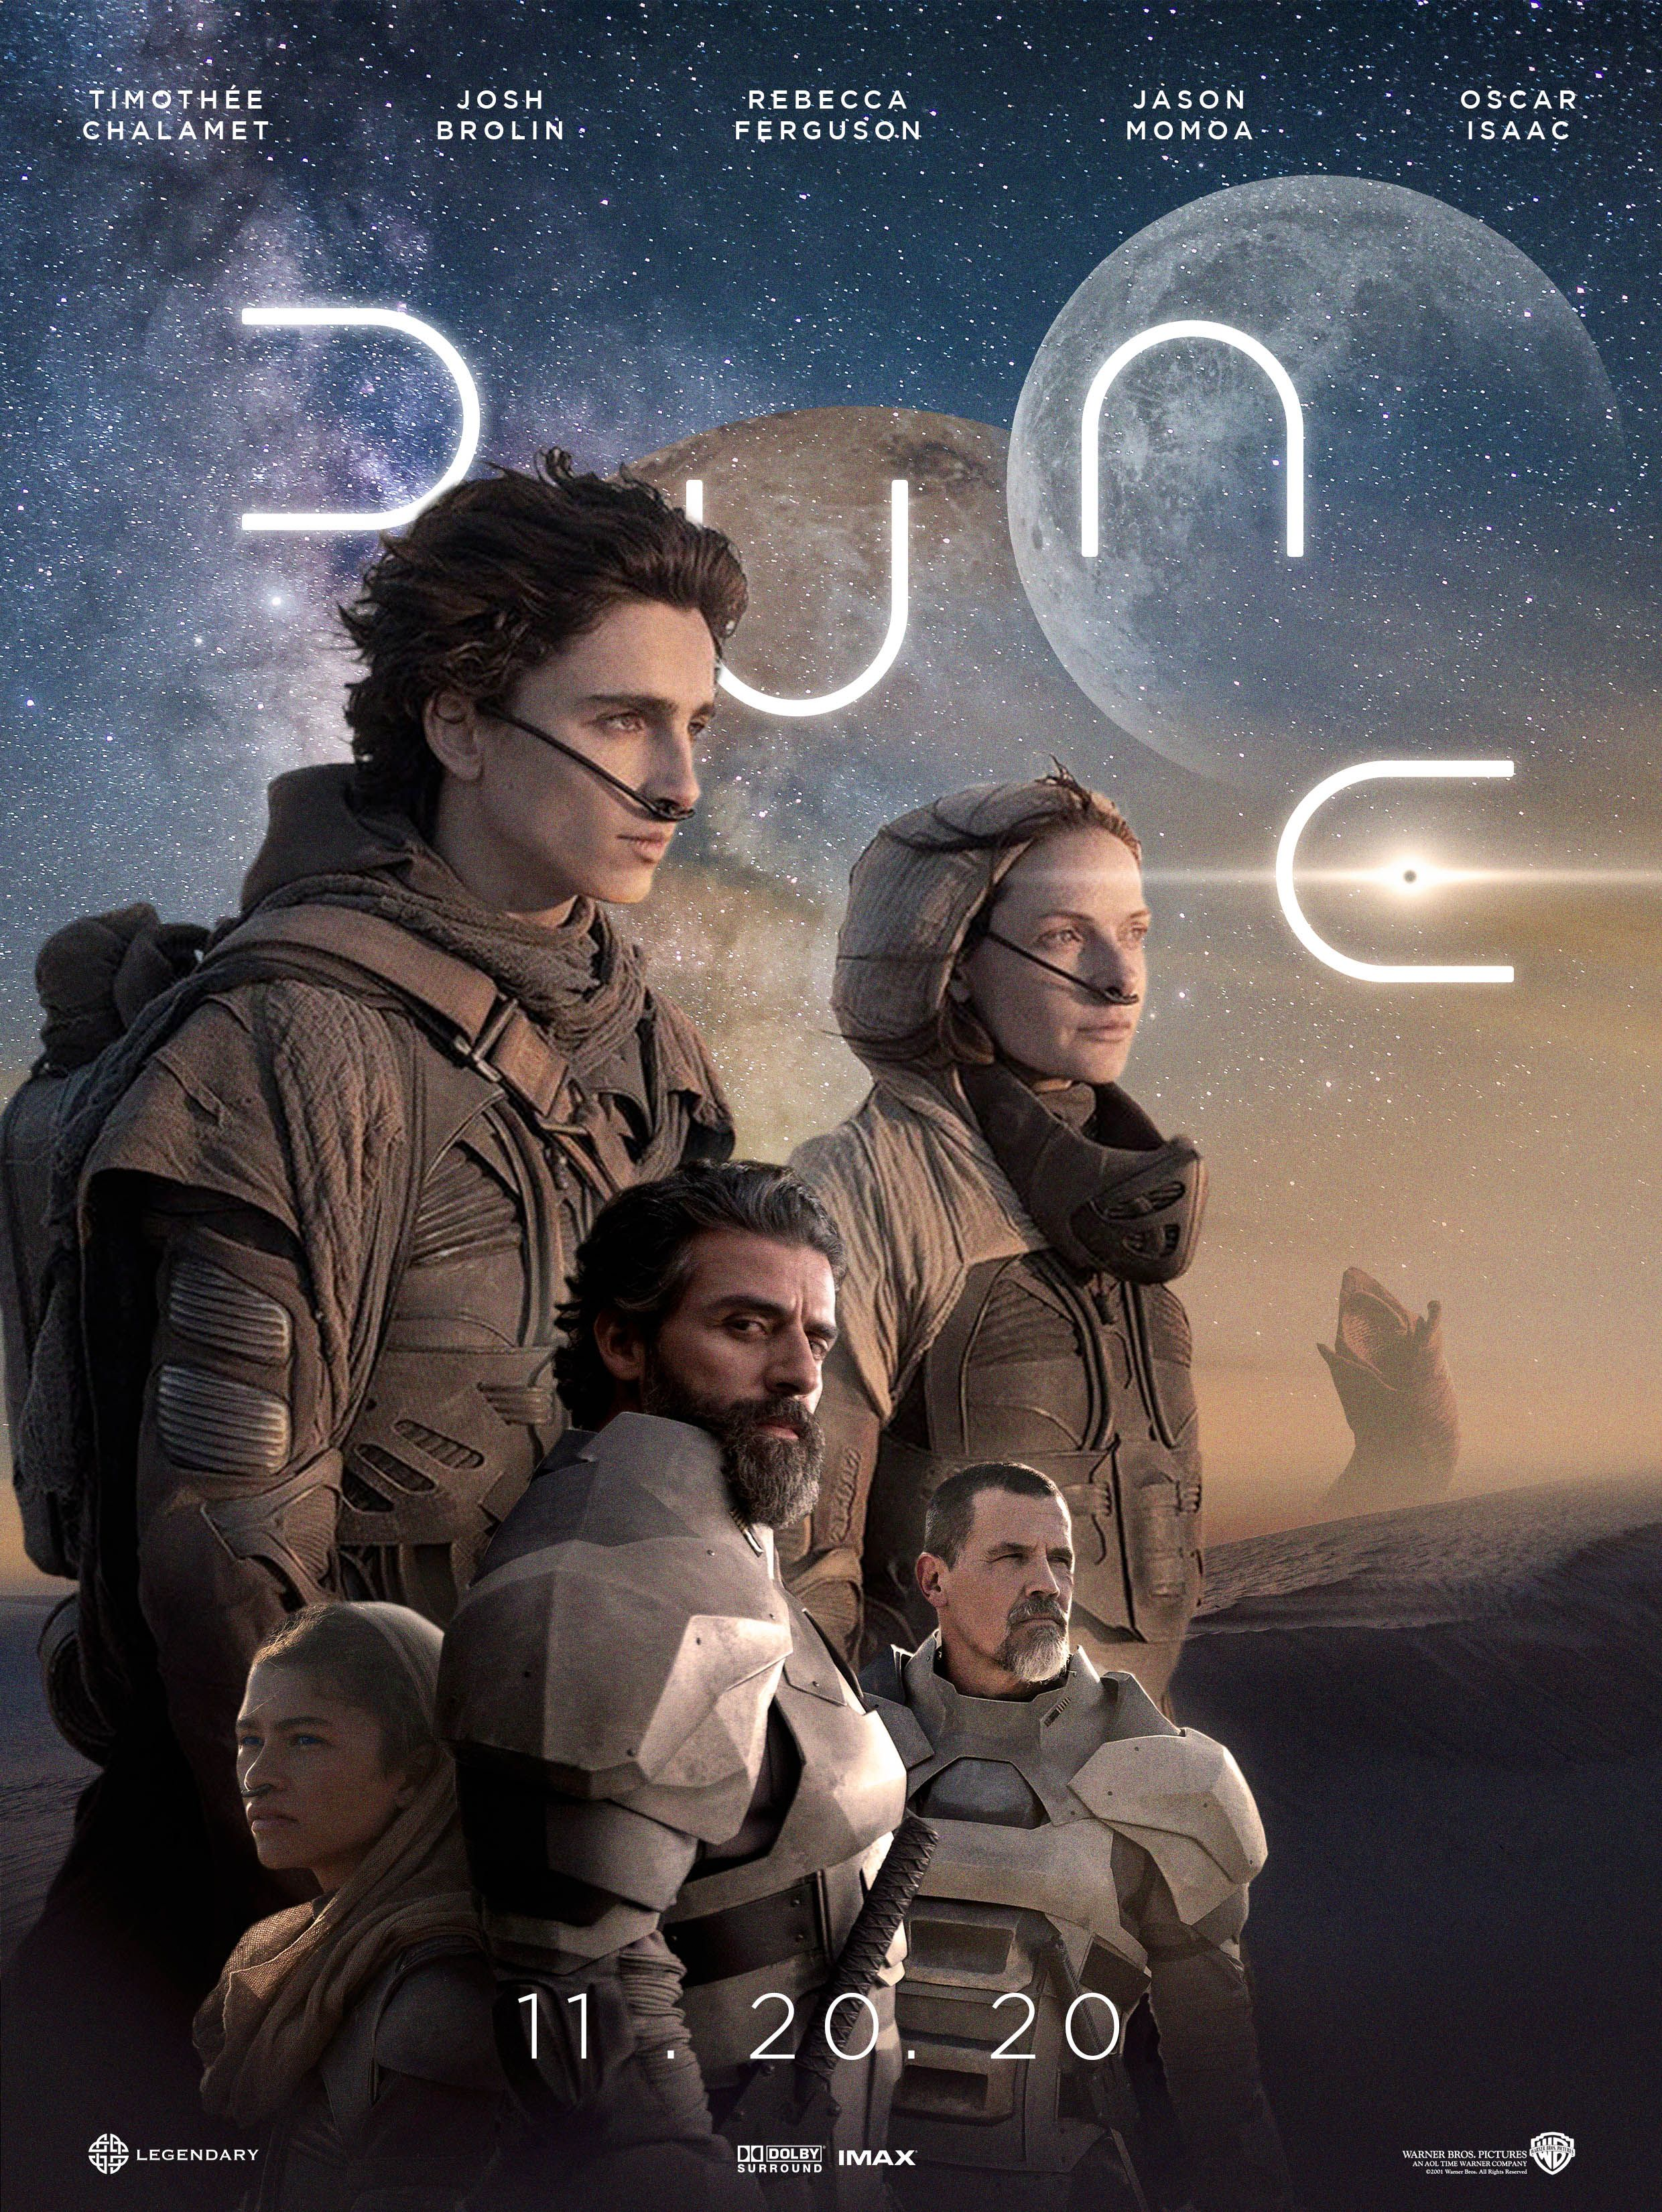 900 Dune Ideas In 2021 Dune Dune Art Dune Frank Herbert